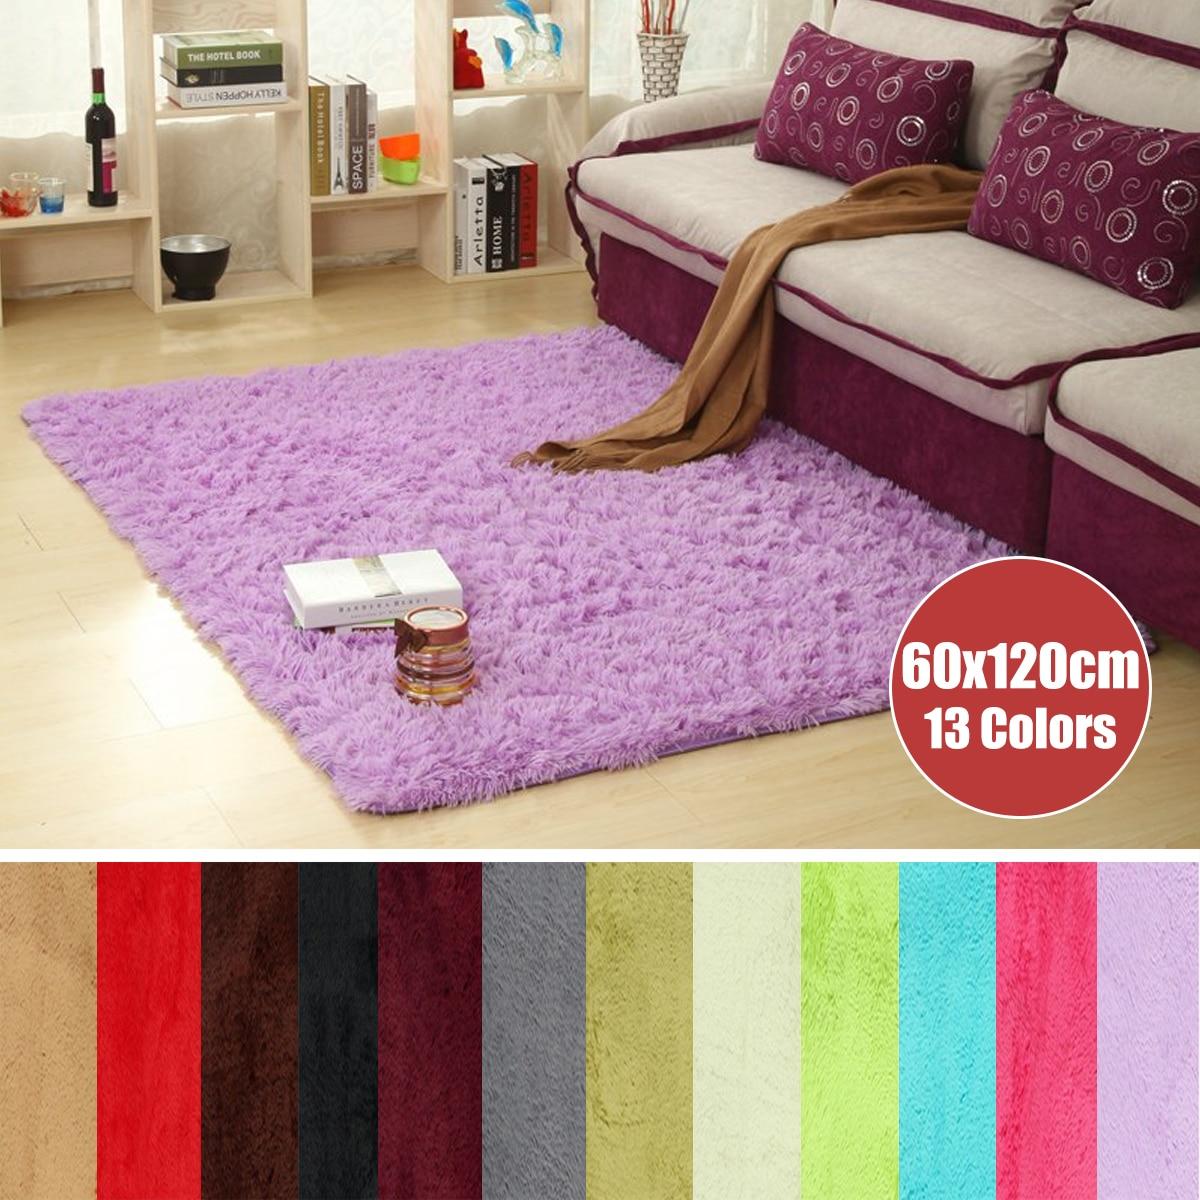 60x120cm Anti Slip Shaggy Fluffy Area Rug Bath Mat Bathroom Door Horizontal Stripes Rug Bedroom Carpet Floor Mat 13 Colors